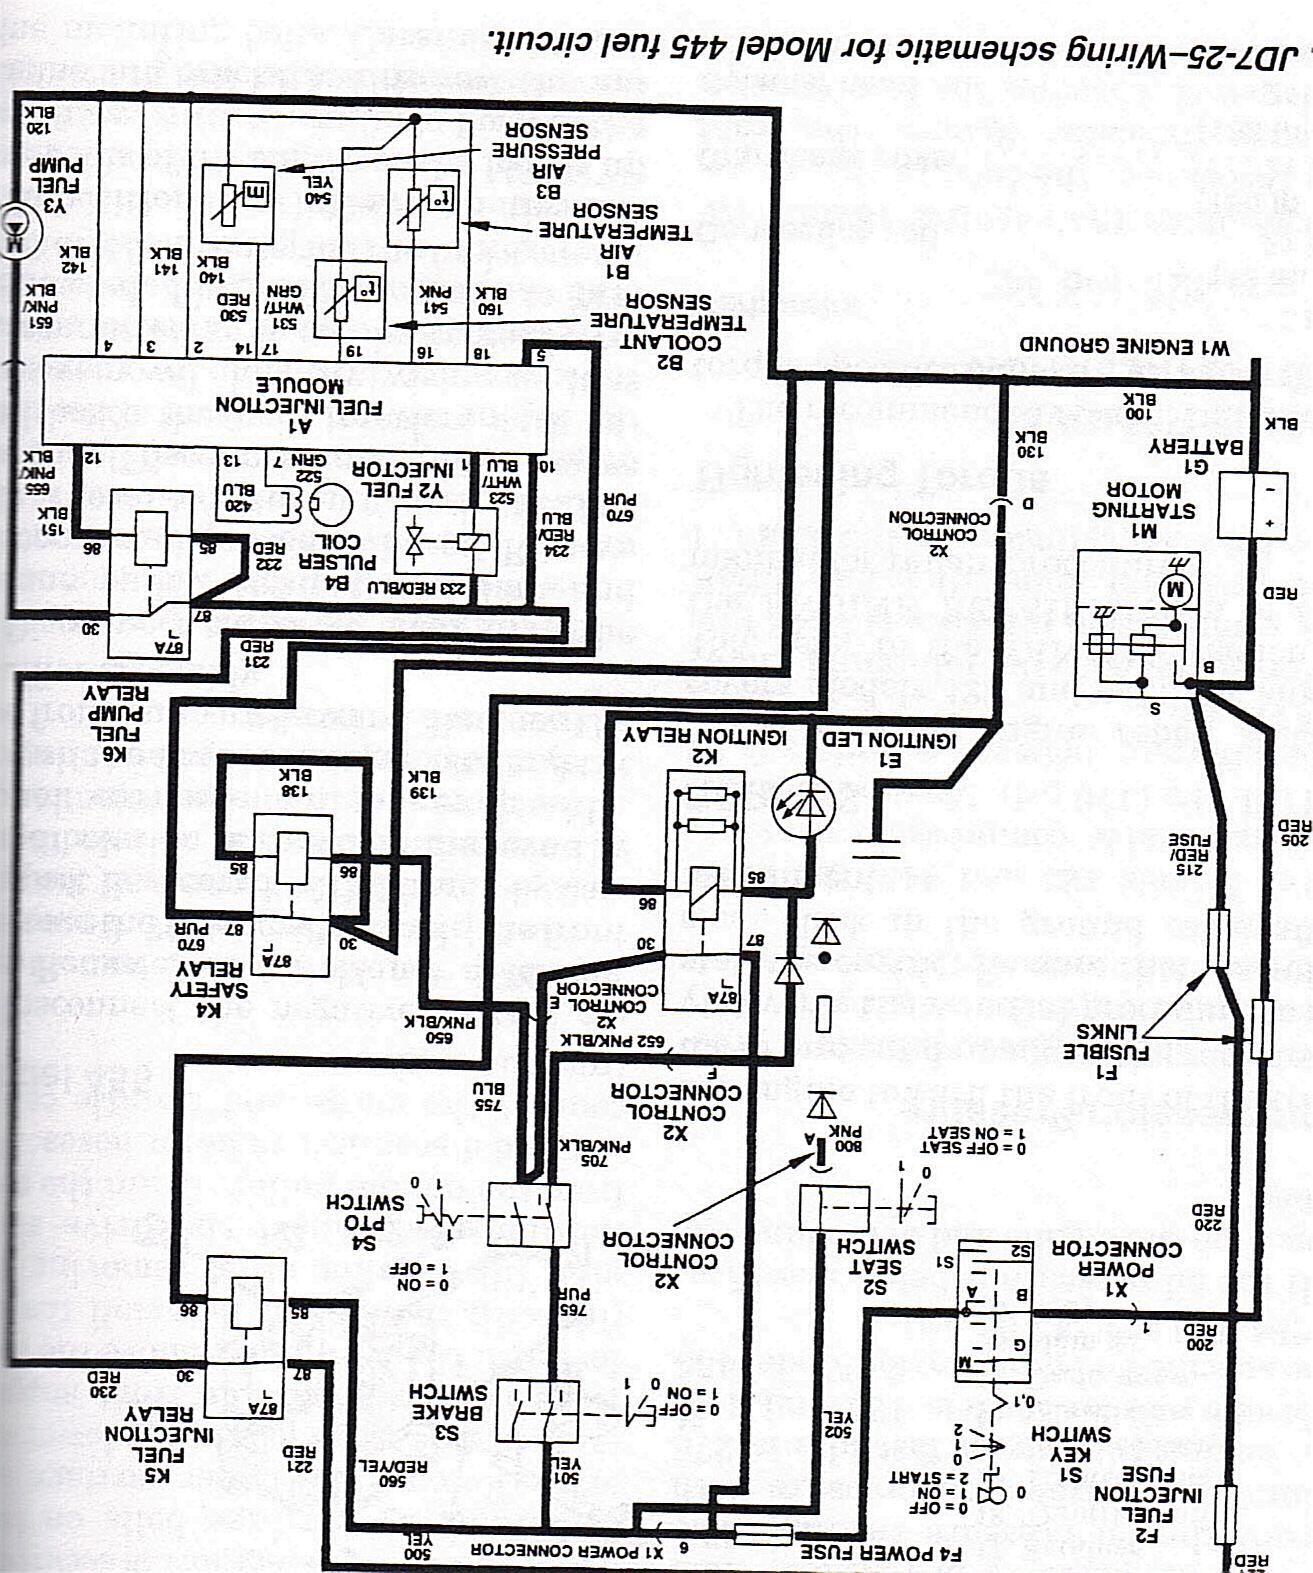 John Deere X485 Wiring Diagram